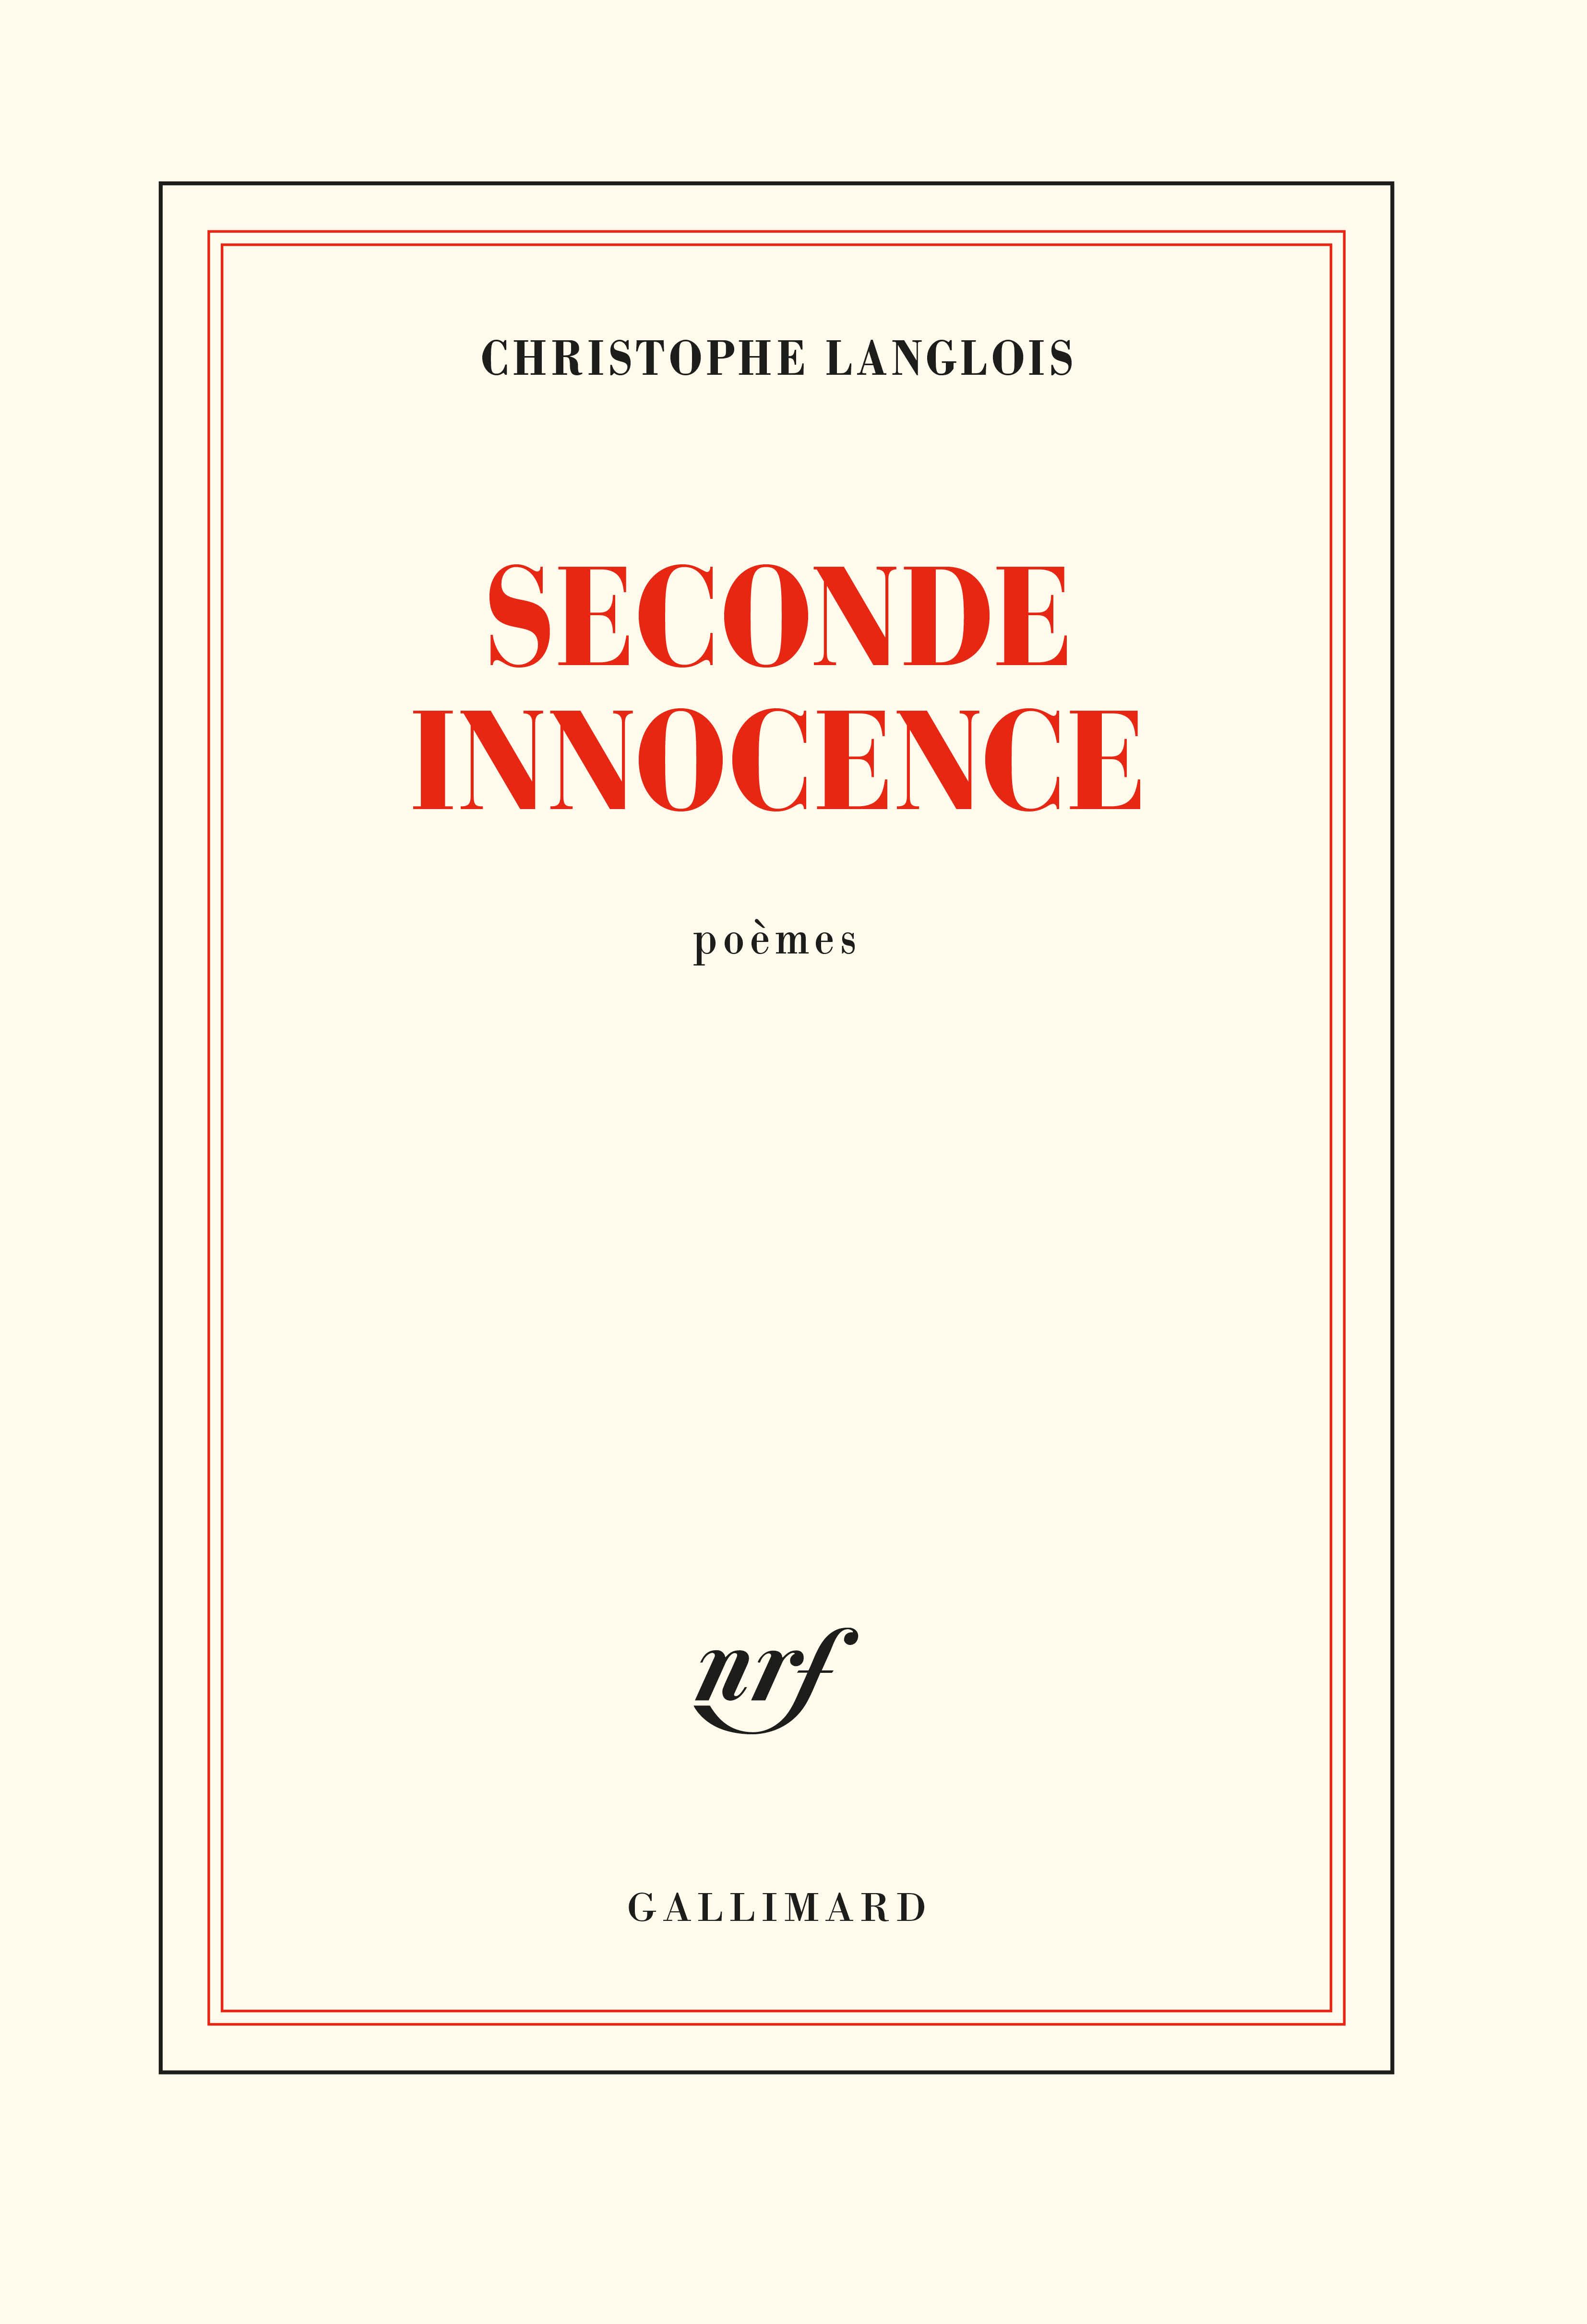 Seconde innocence